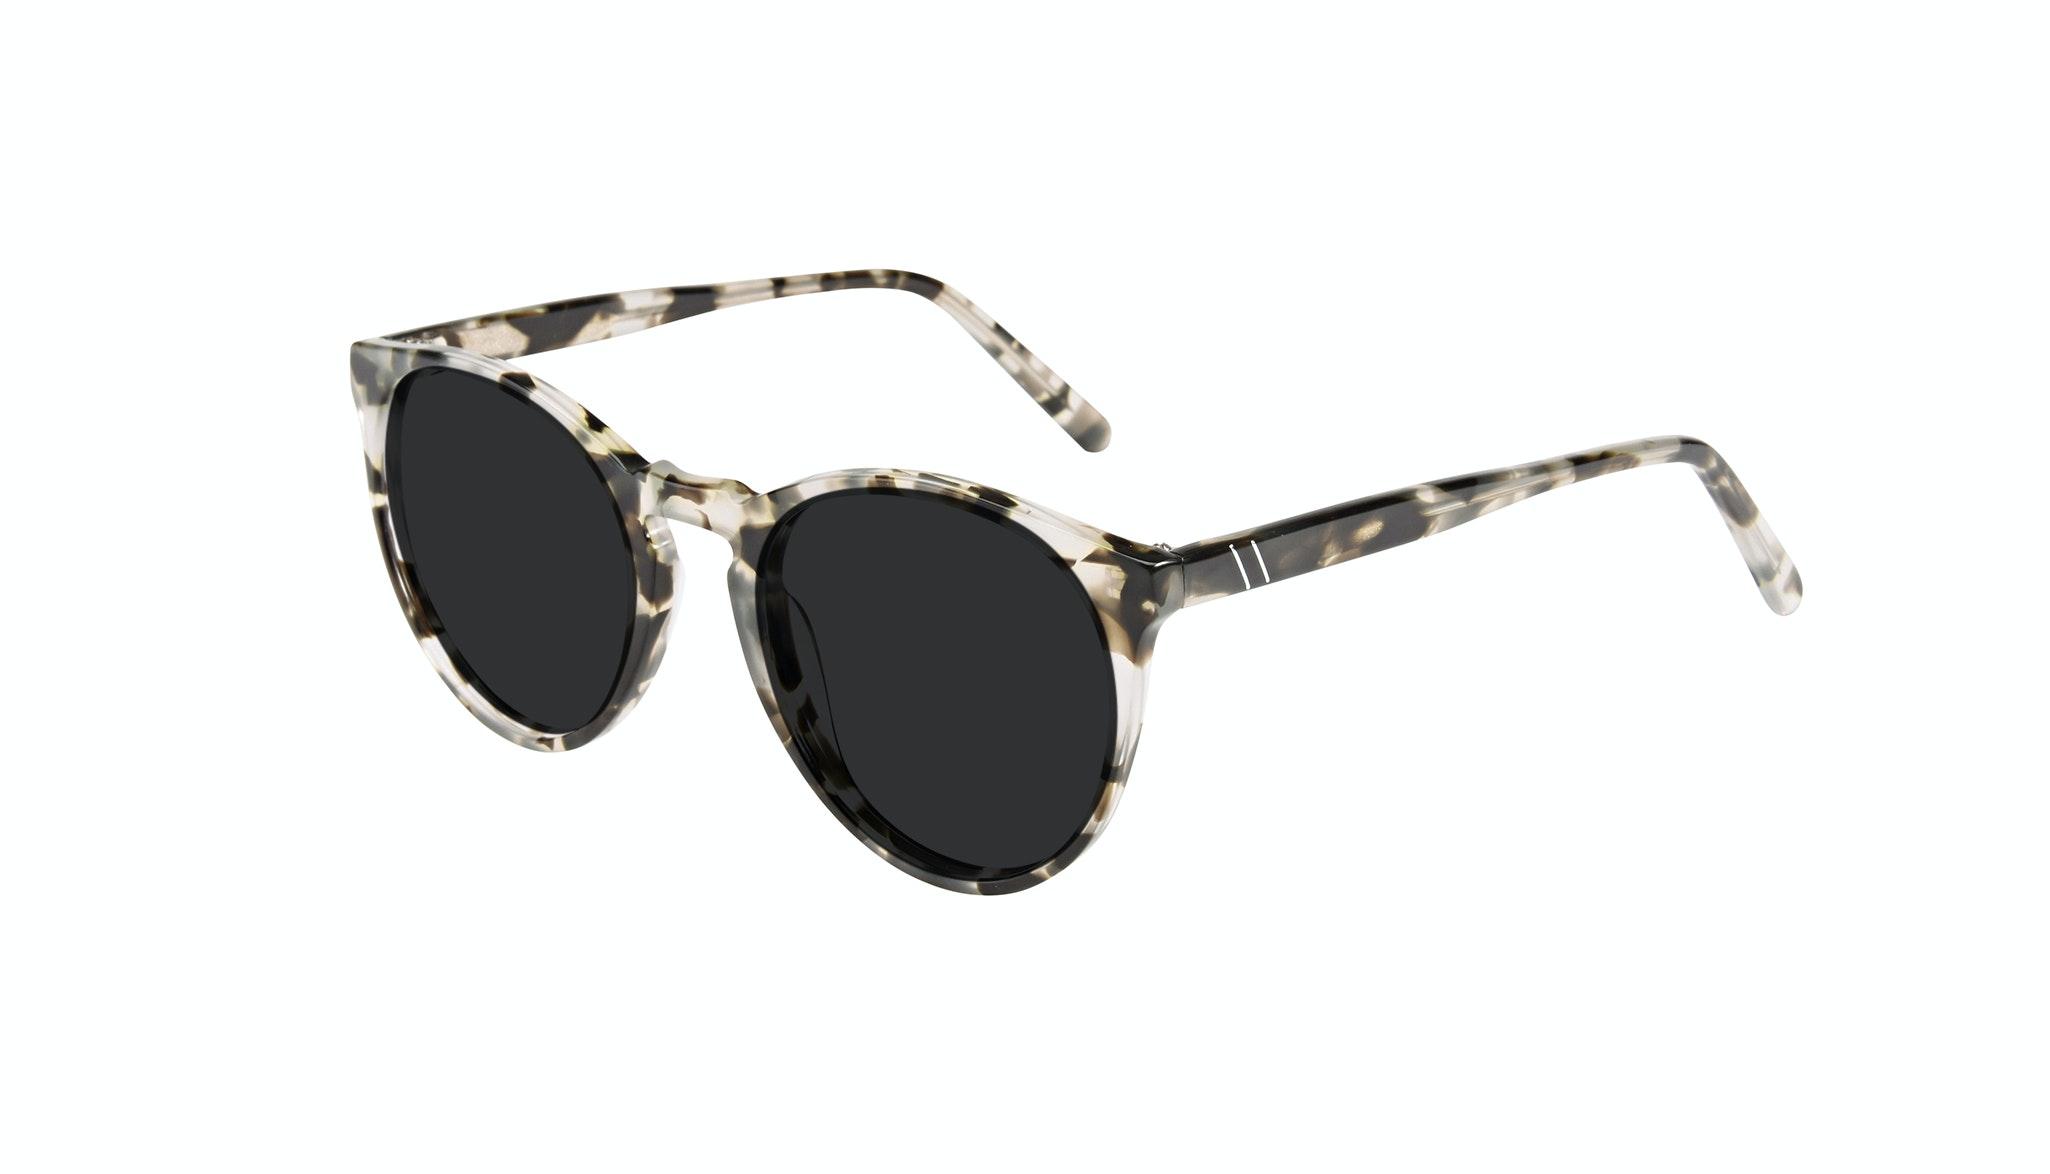 Affordable Fashion Glasses Round Sunglasses Men Arch Camo Tort Tilt